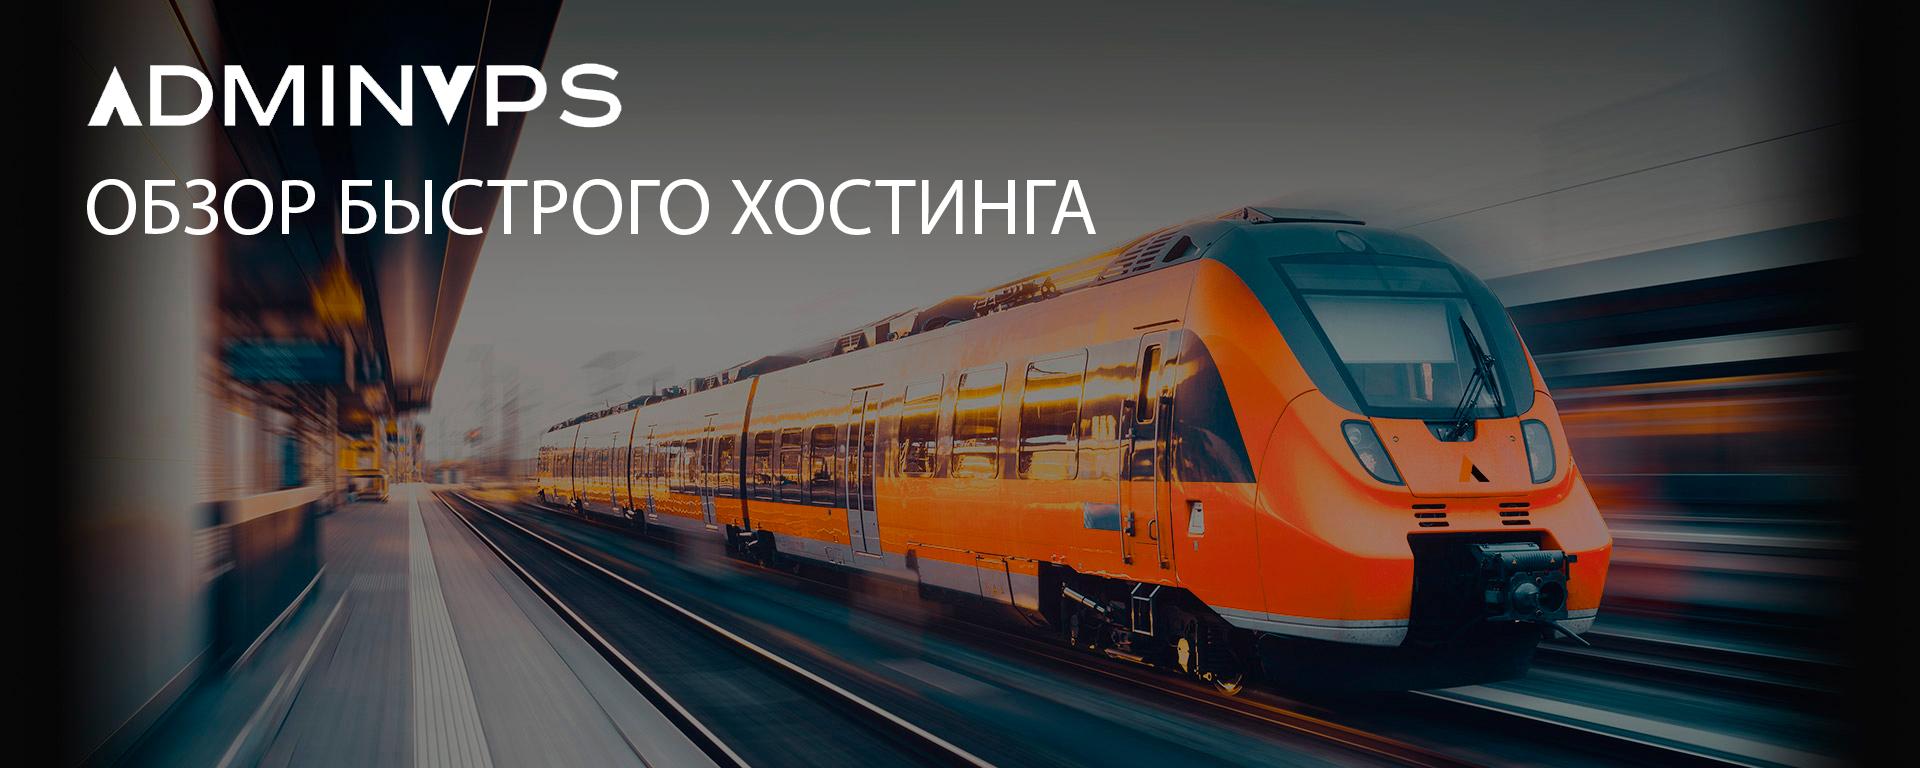 Adminvps.ru - обзор быстрого VPS/VDS хостинга